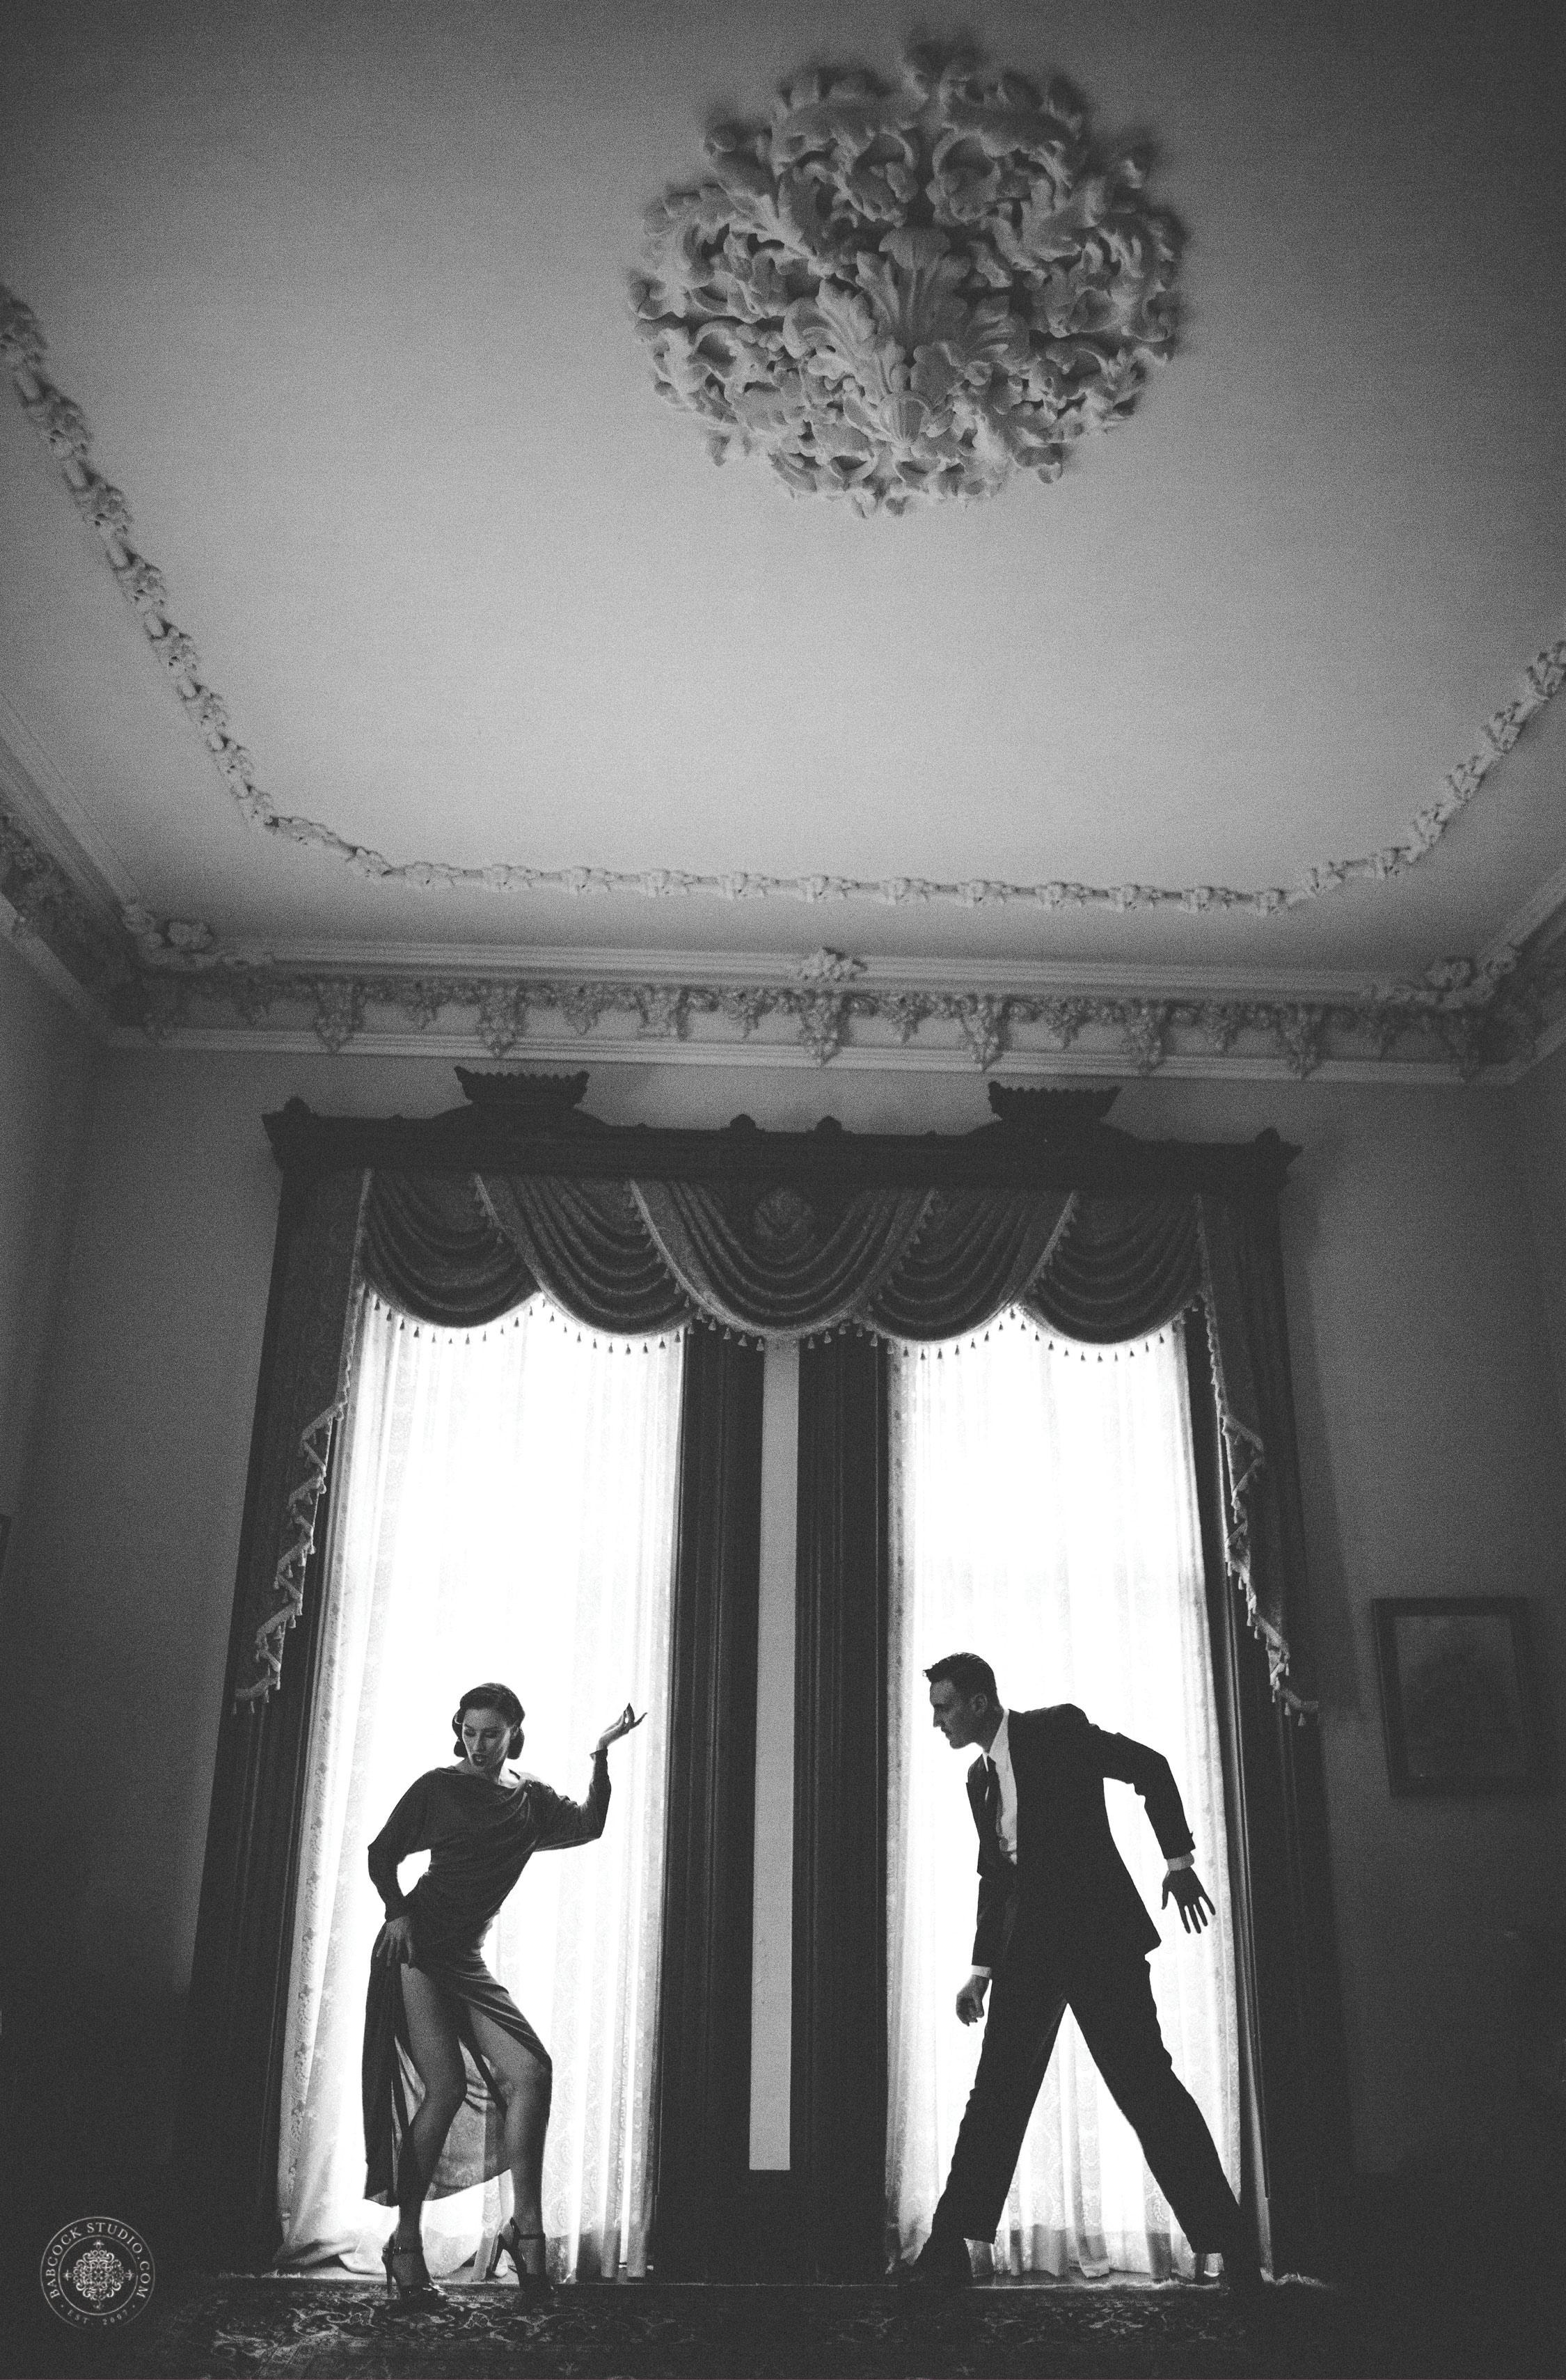 chris-eden-vintage-styled-photographer-dayton-ohio-.jpg